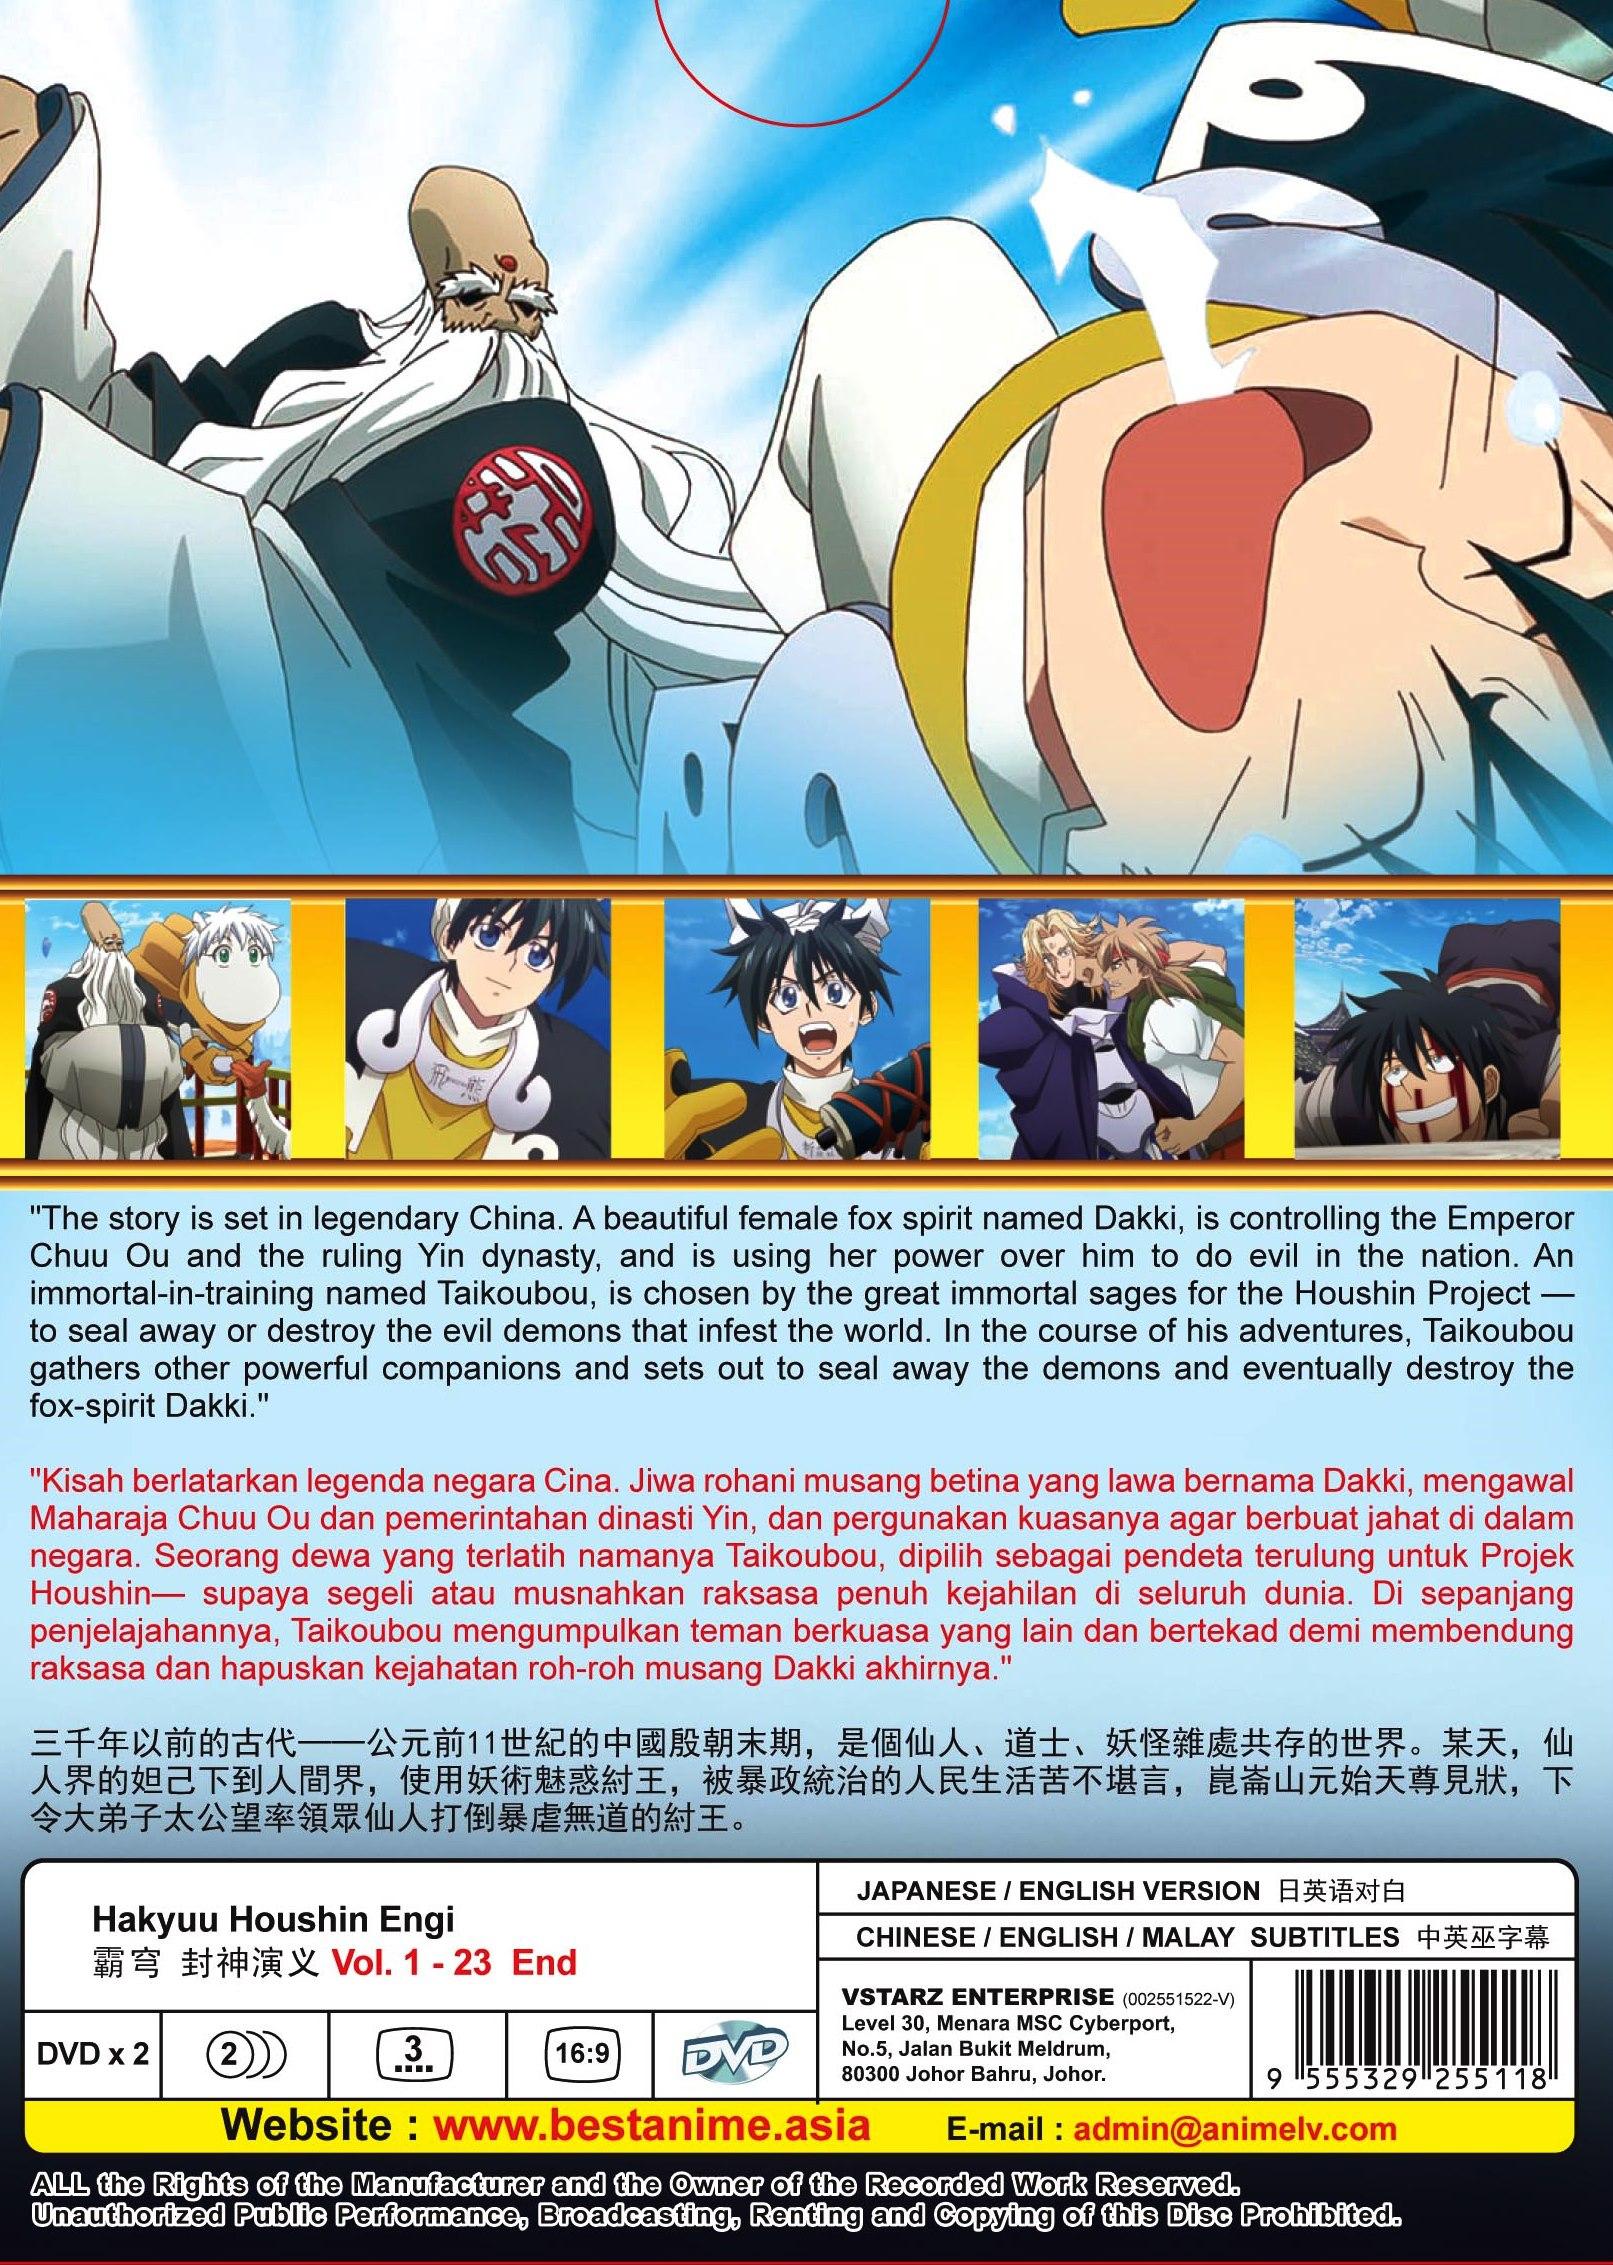 Hakyuu Houshin Engi Vol 1-23 End Anime DVD (Eng Dub)